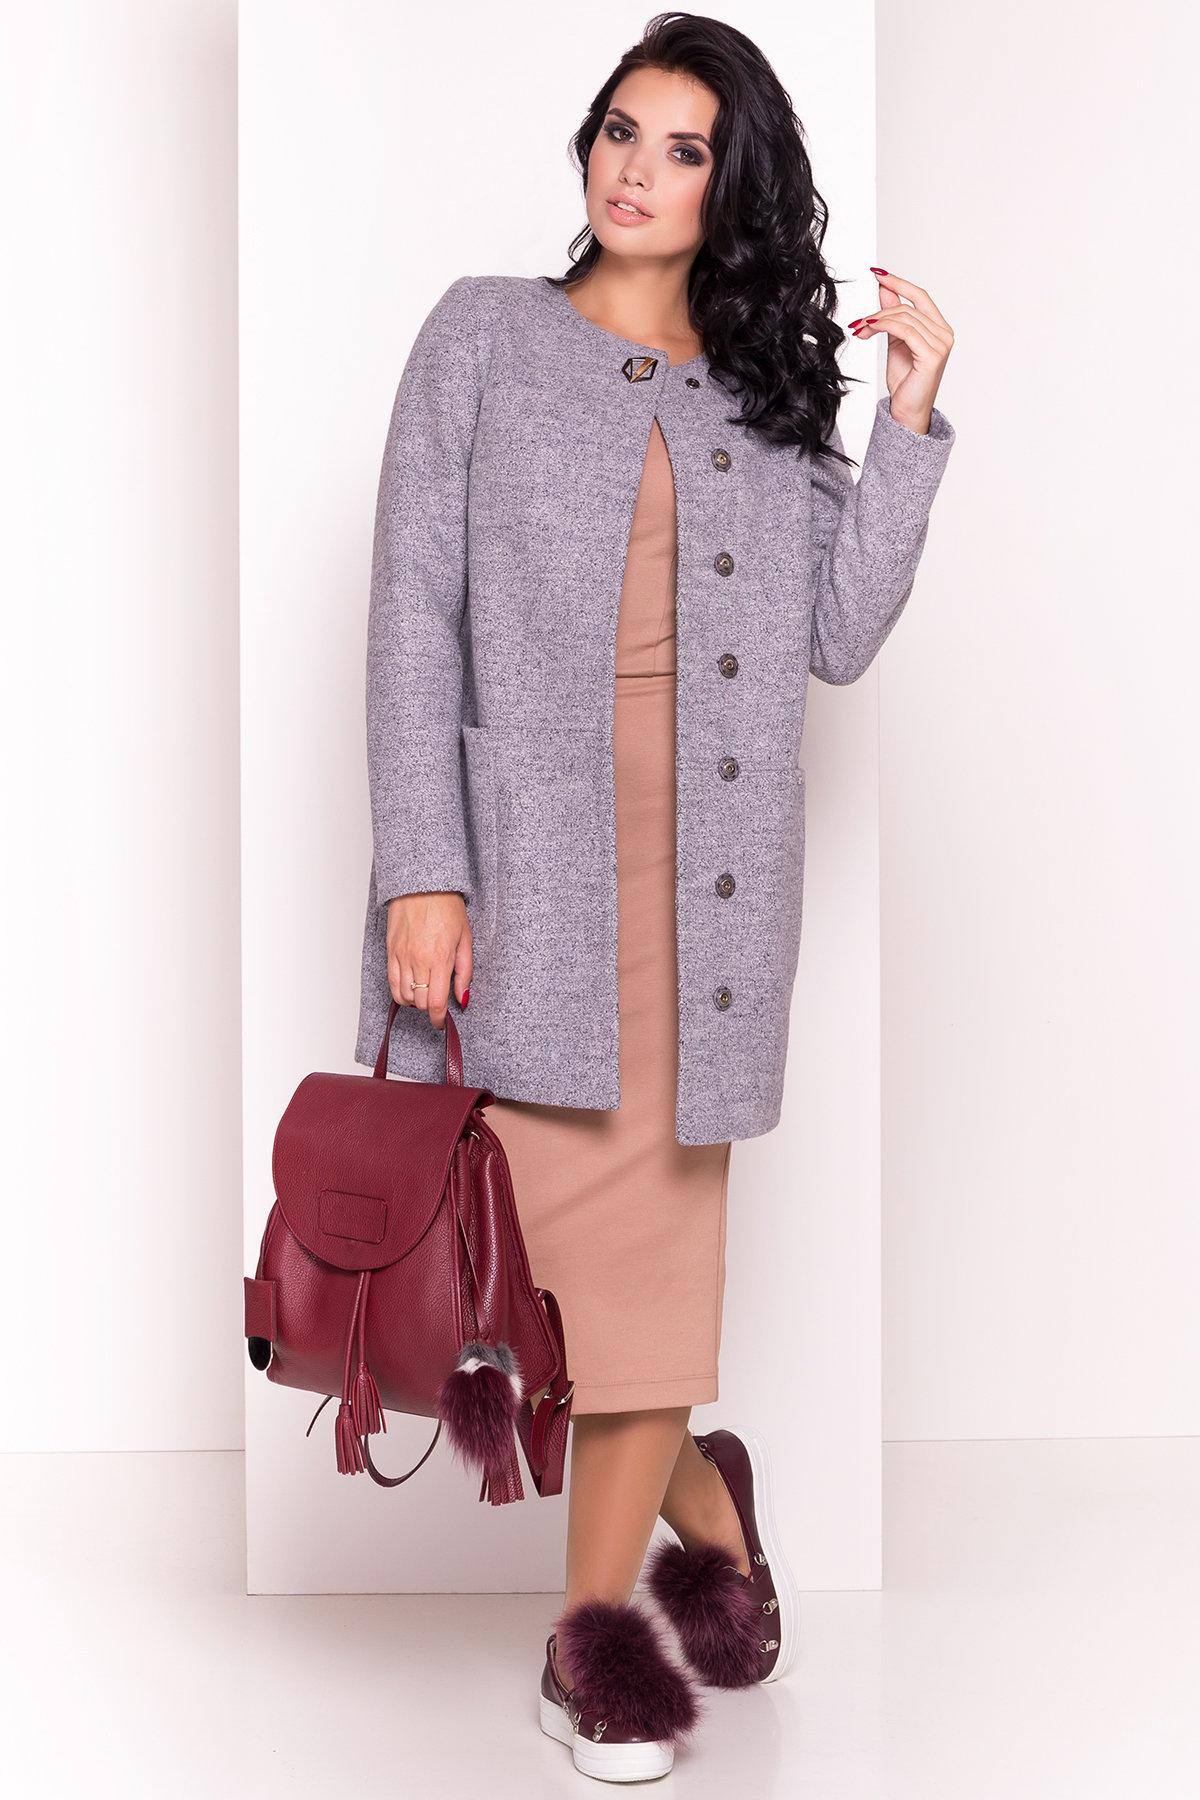 Пальто на весну Дакс 1679 АРТ. 9498 Цвет: Серый 48 - фото 1, интернет магазин tm-modus.ru